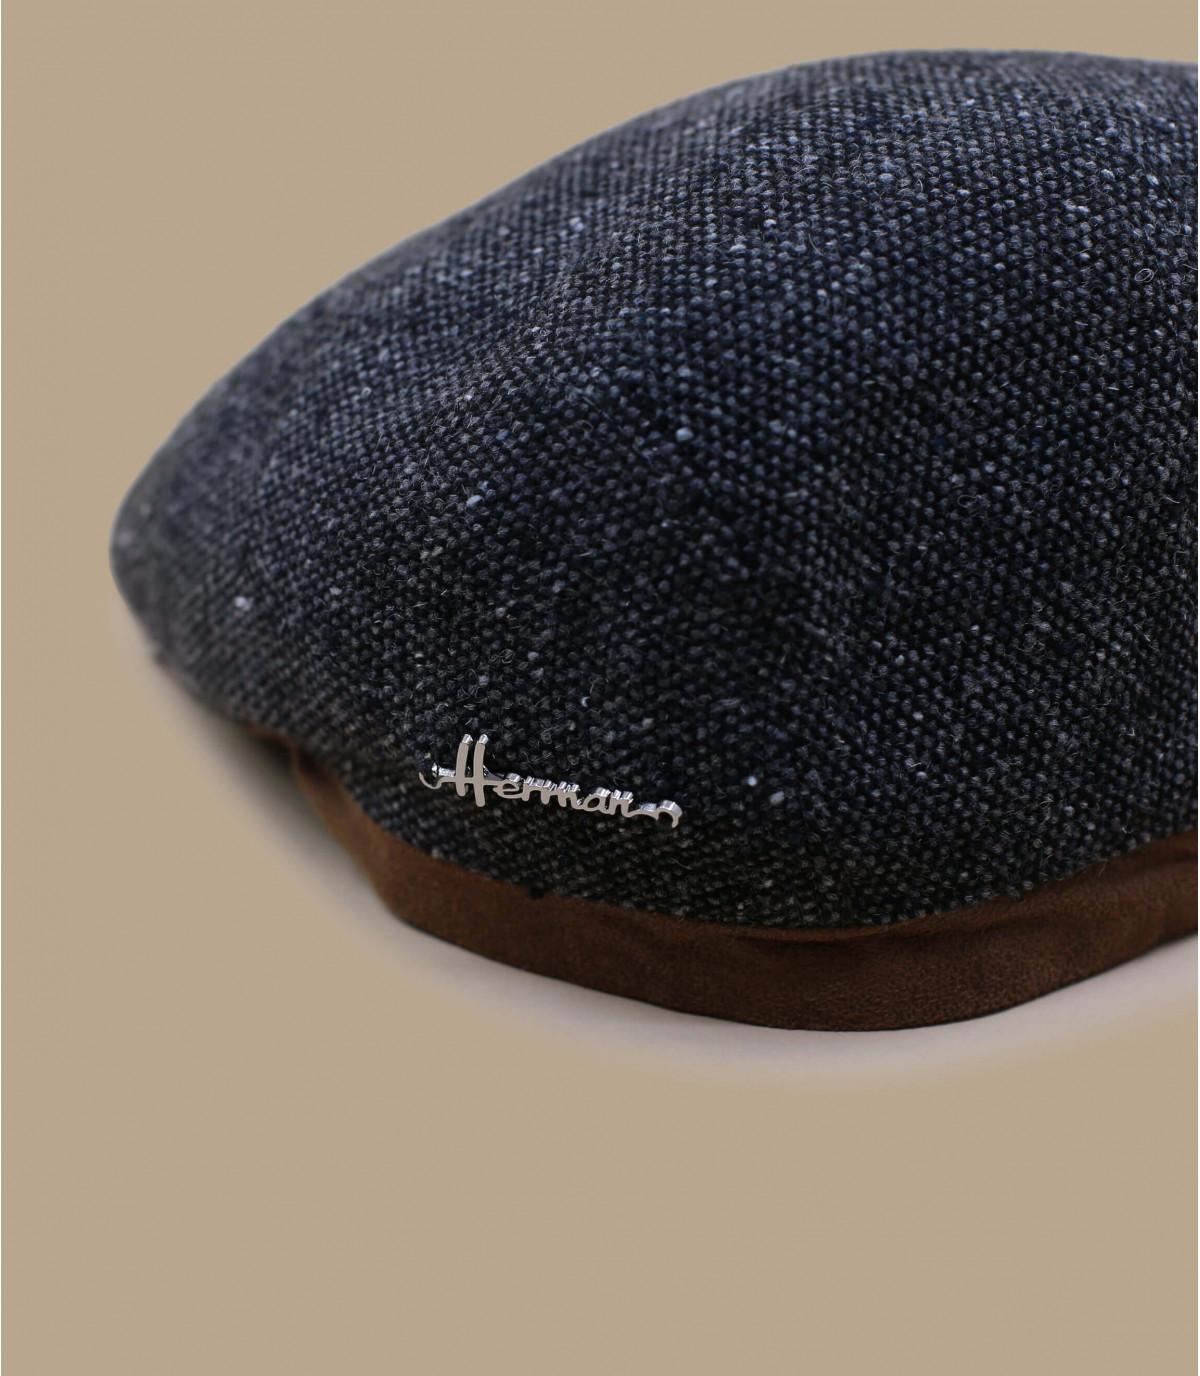 Details Range Wool charcoal - afbeeling 2